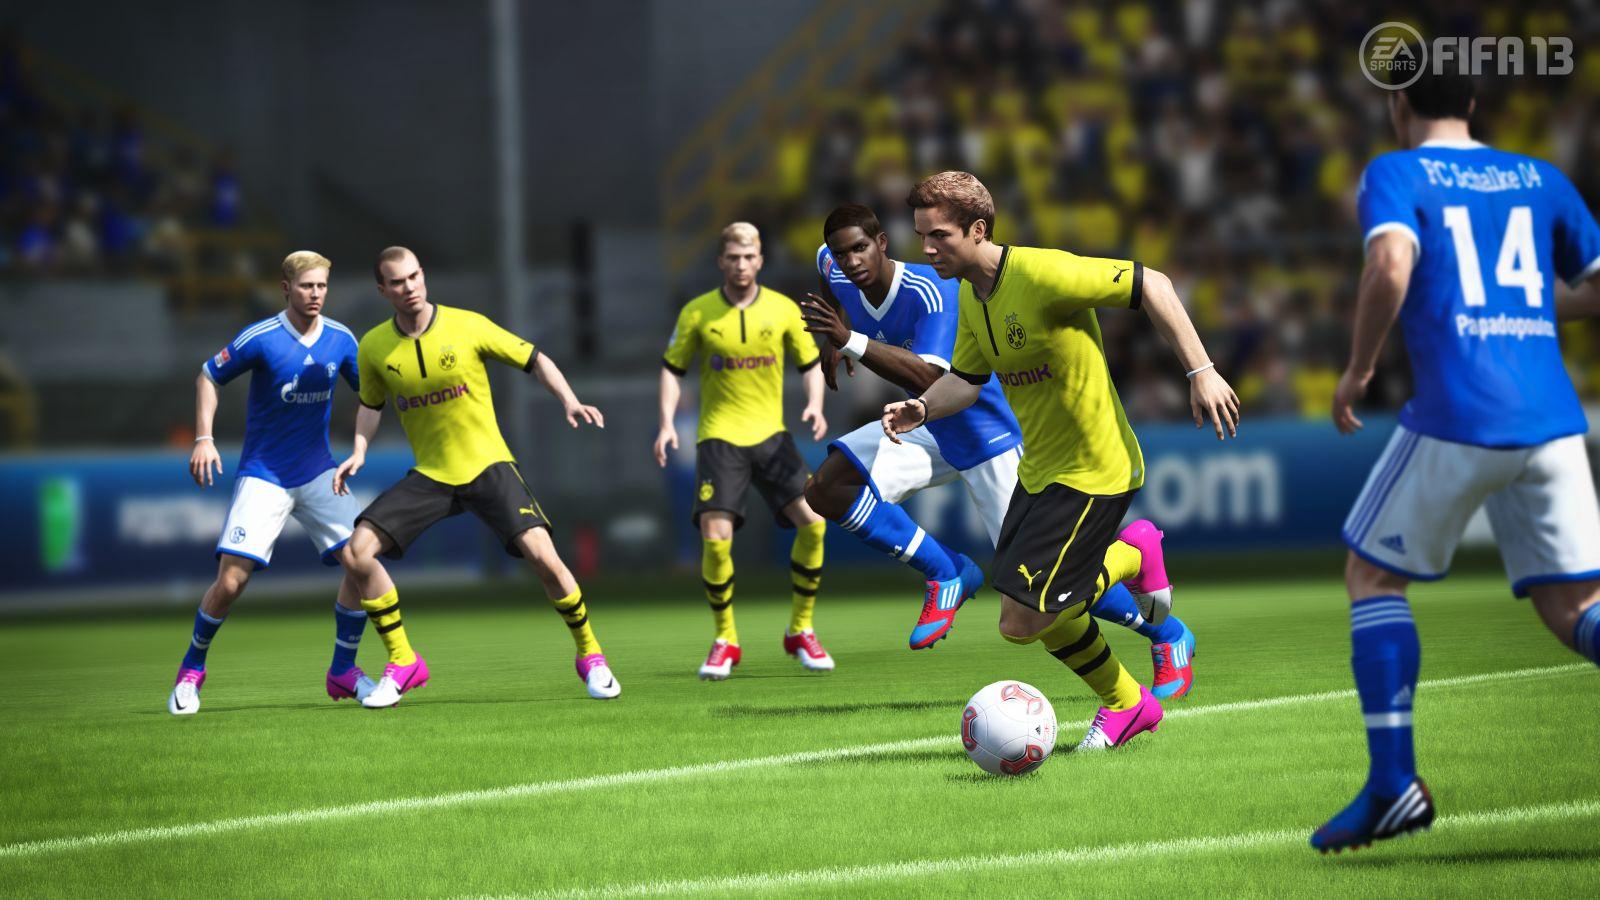 FIFA 13 – fotbálek jedna báseň 70588